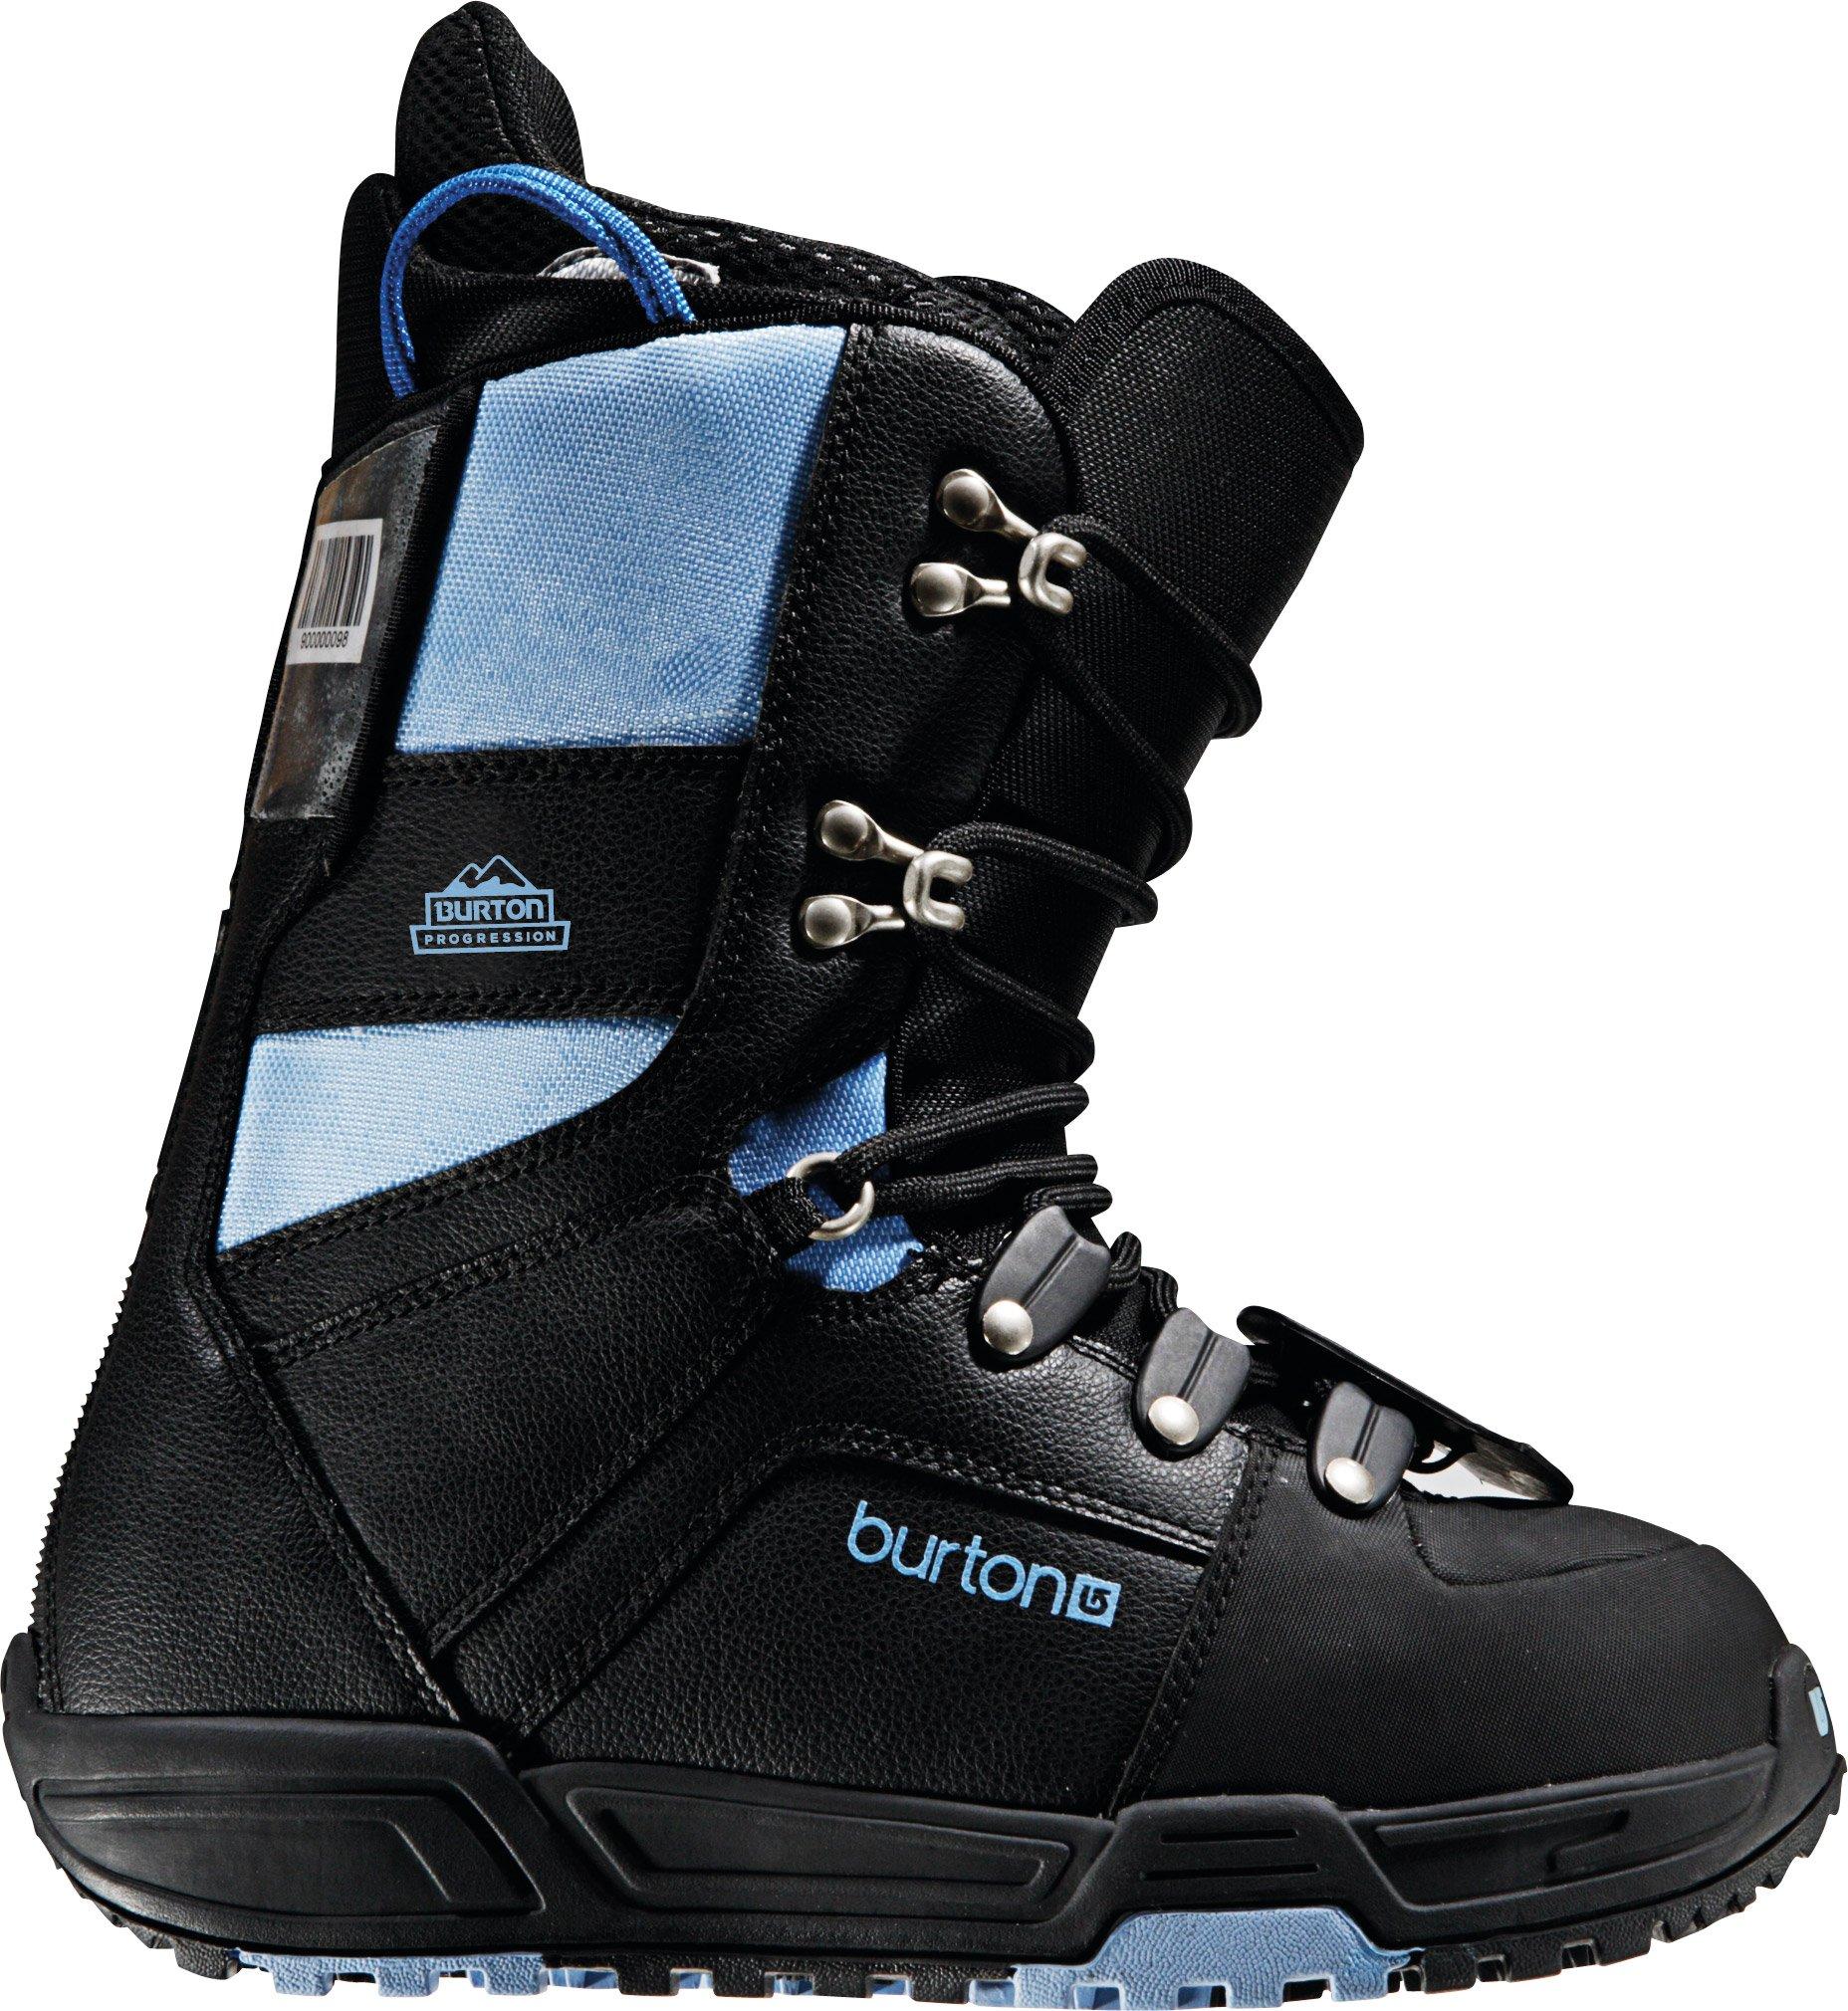 Burton Progression Womens Snowboard Boot 2009, Charcoal/Grey, 4